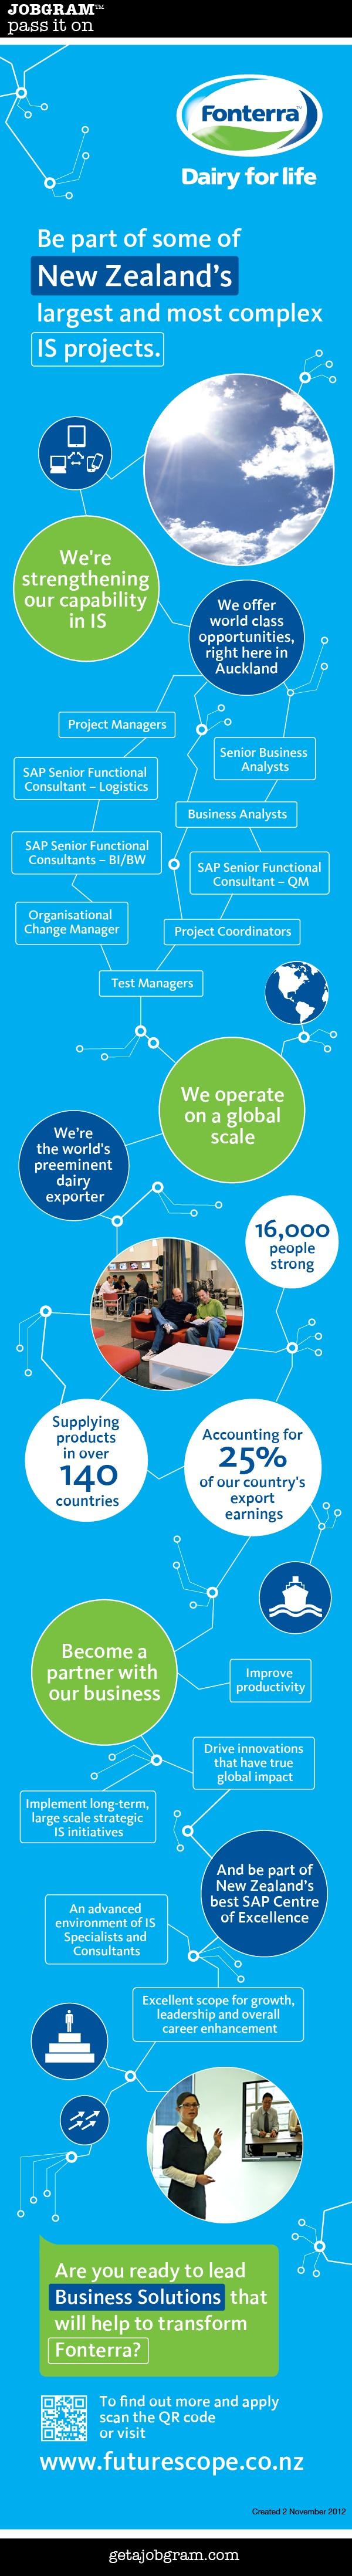 Company Overview: Fonterra